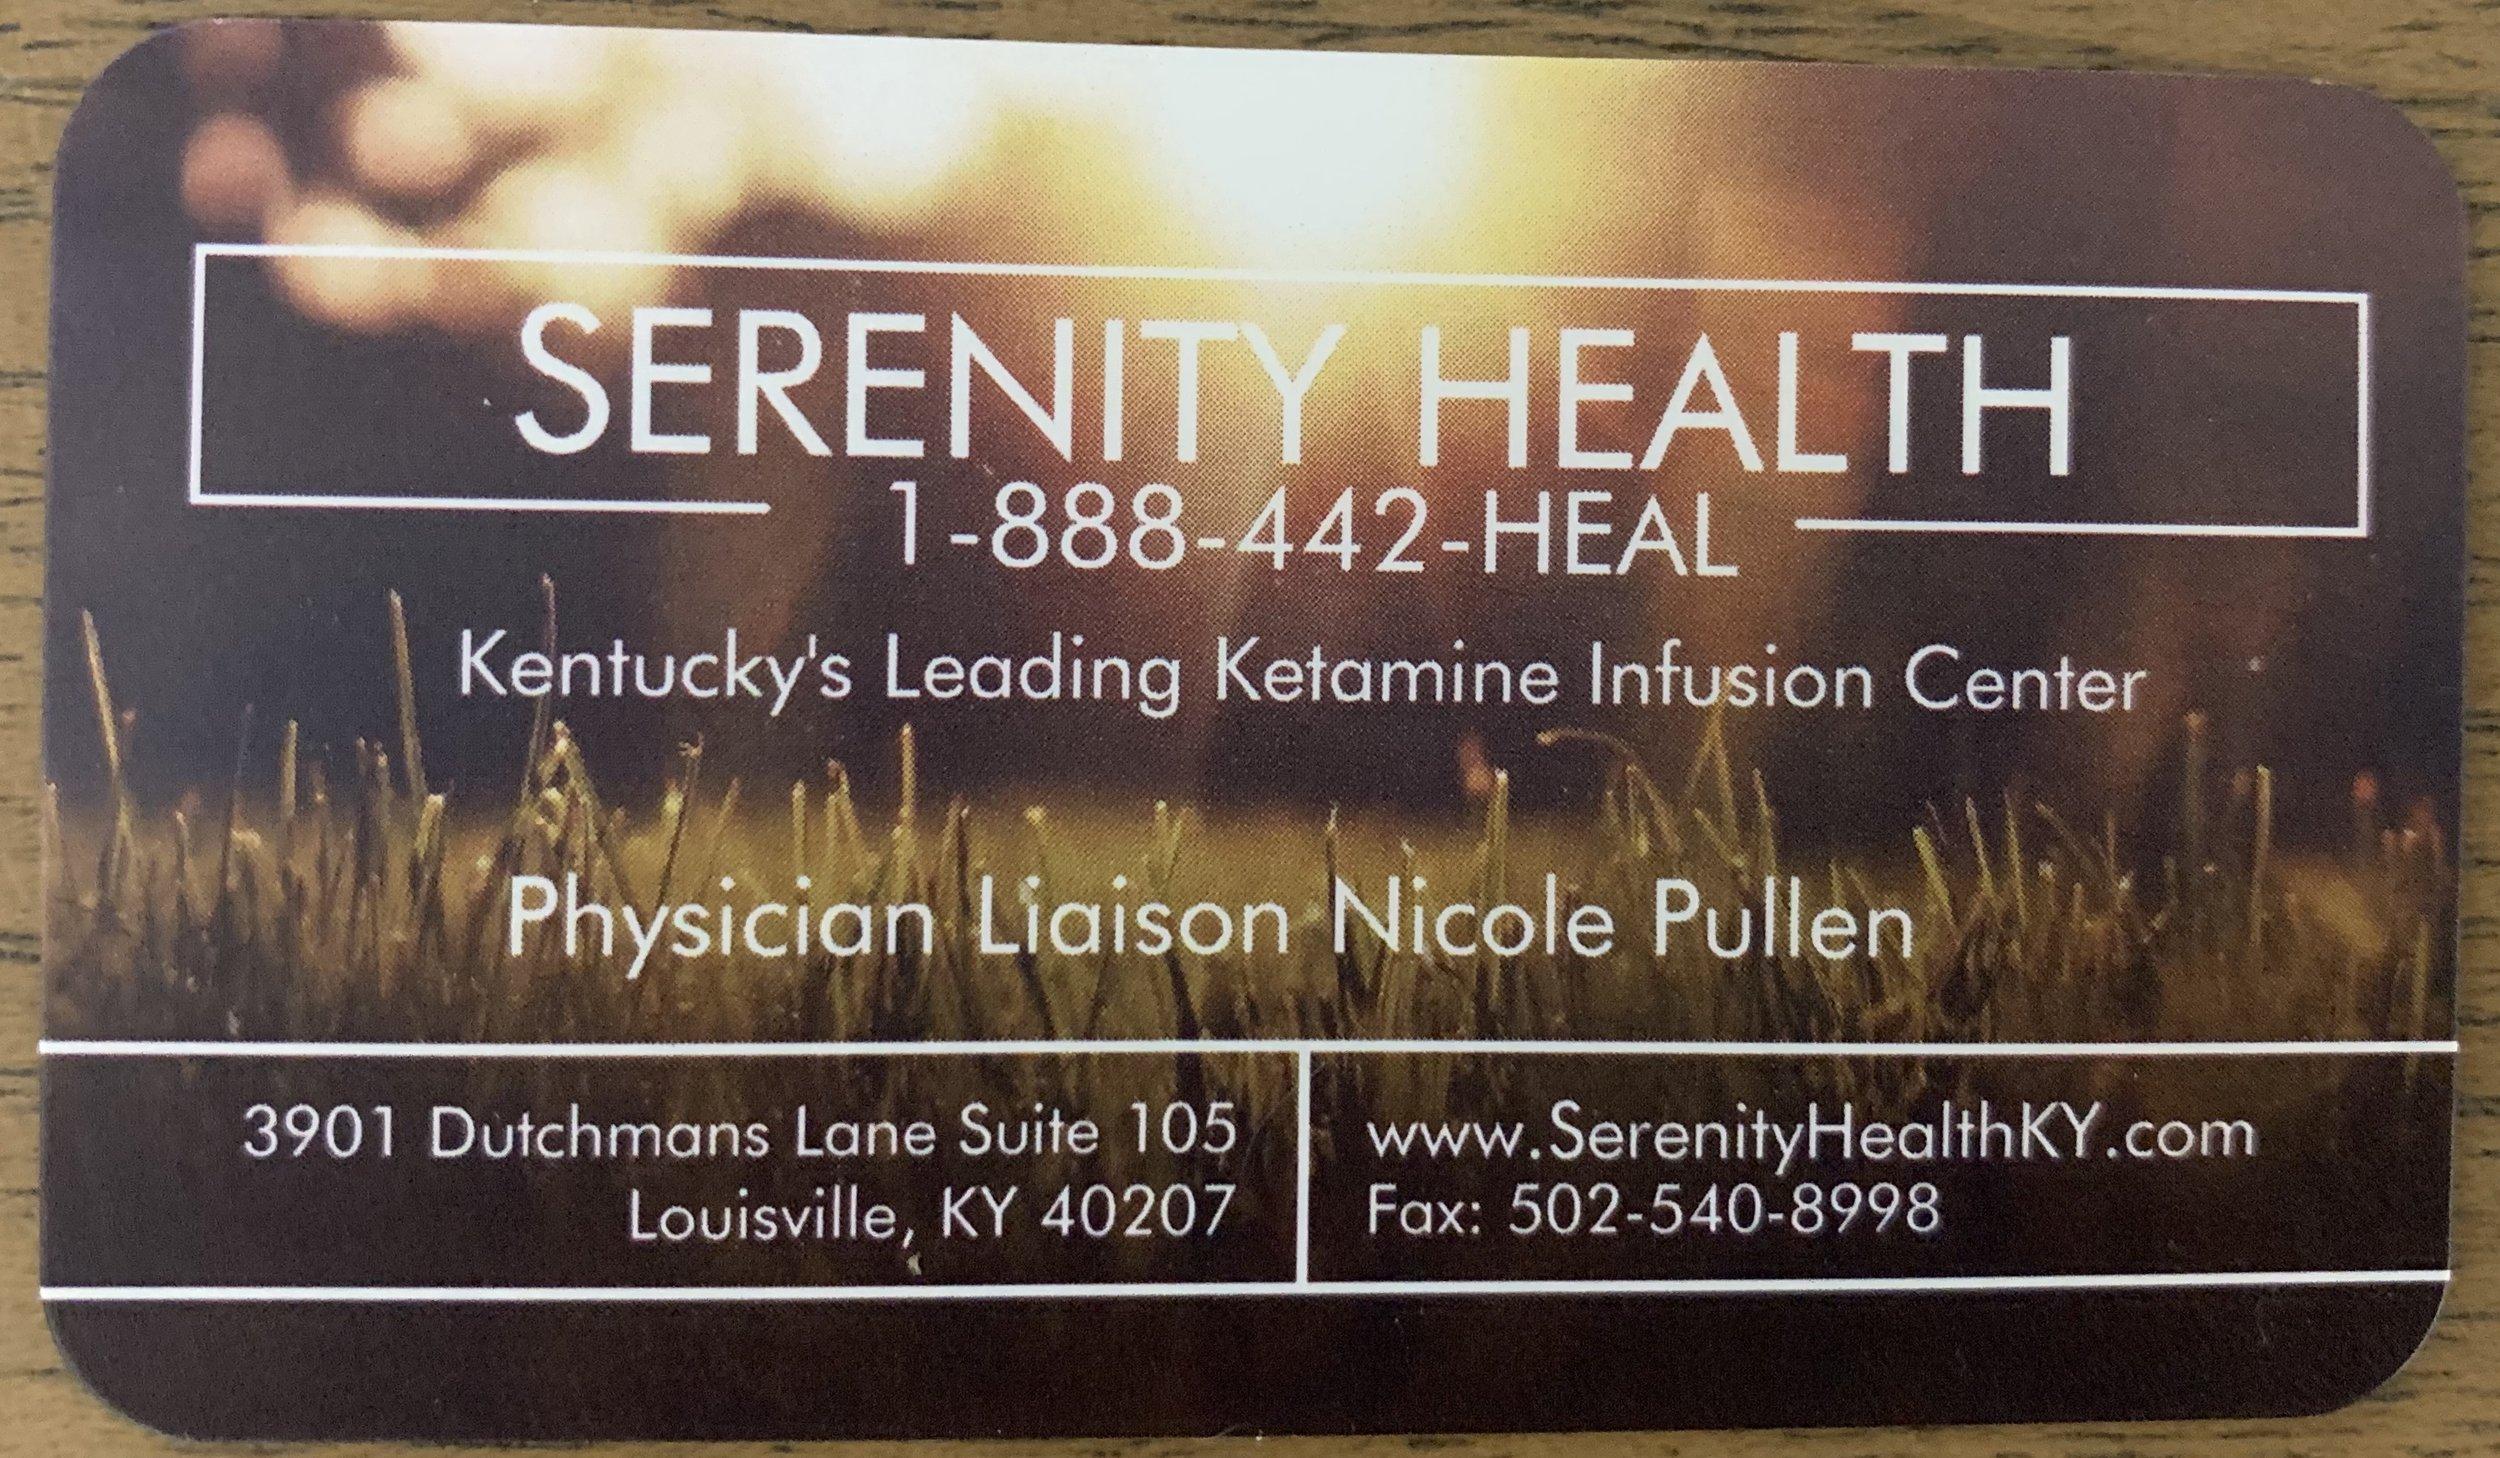 Serenity Health, Kentucky's Leading Ketamin Infusion Center, Nicole Pullen